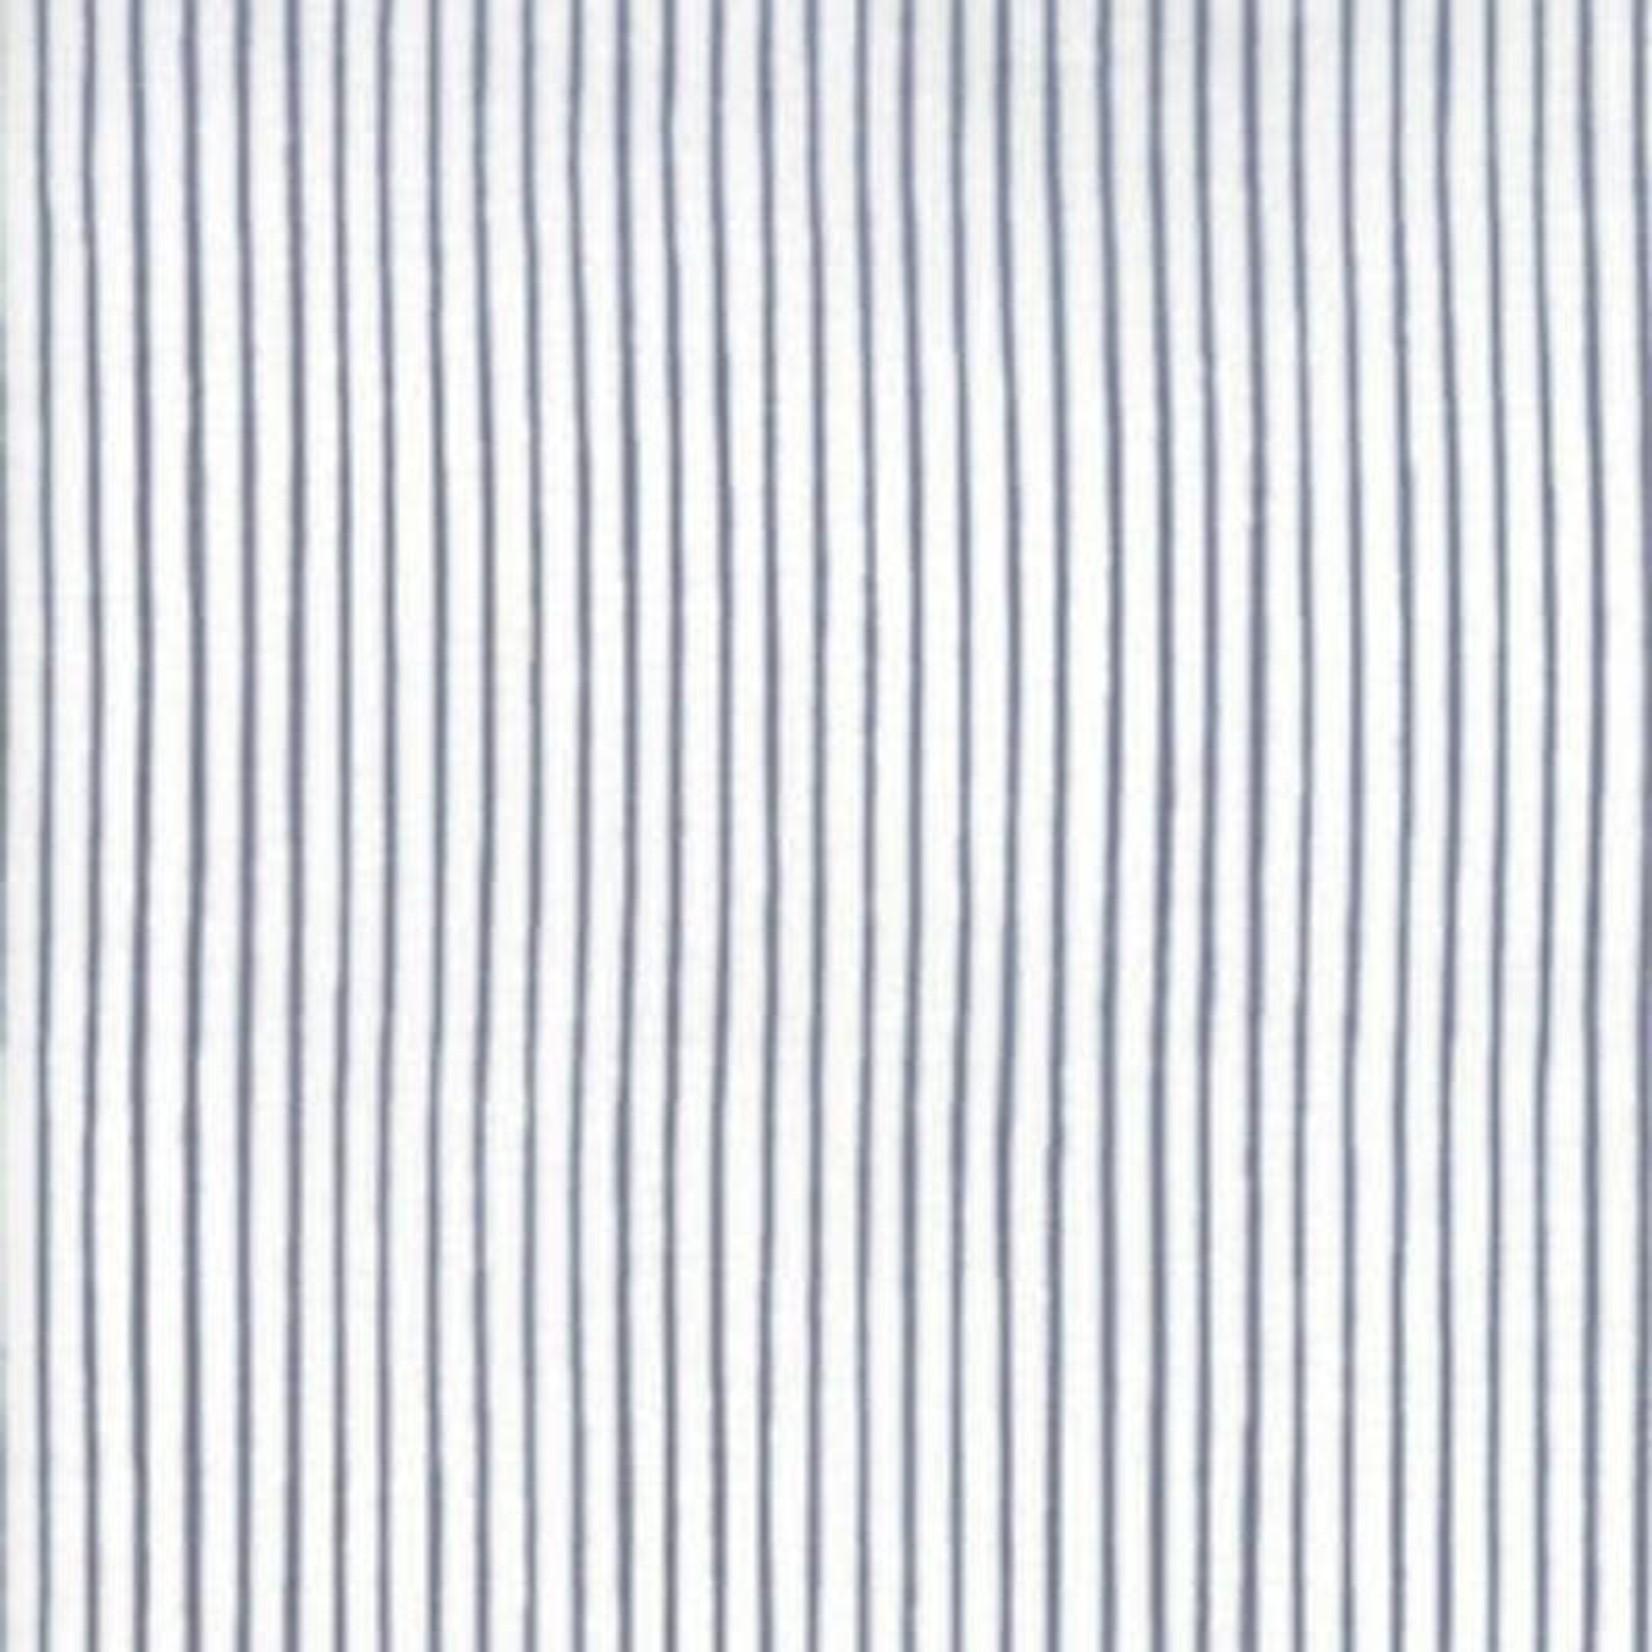 Moda MODAFICATION, STRIPES, BLACK ON WHITE PER CM OR $20/M